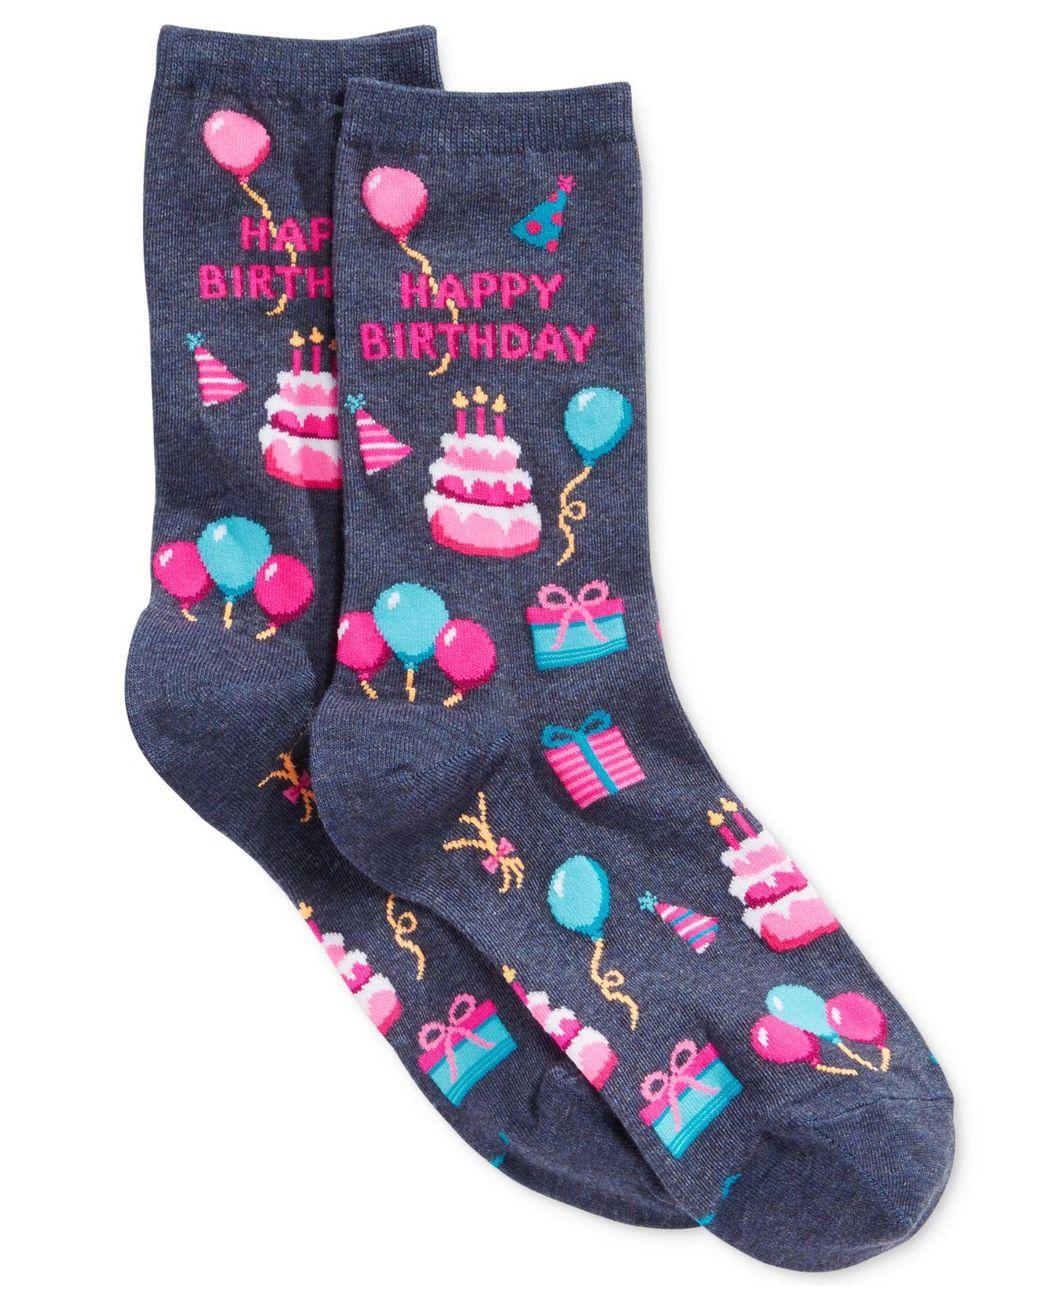 Hot Sox Teacup Pig Crew Socks Purple Novelty Piggy Sock shoe size 4-10.5 NEW